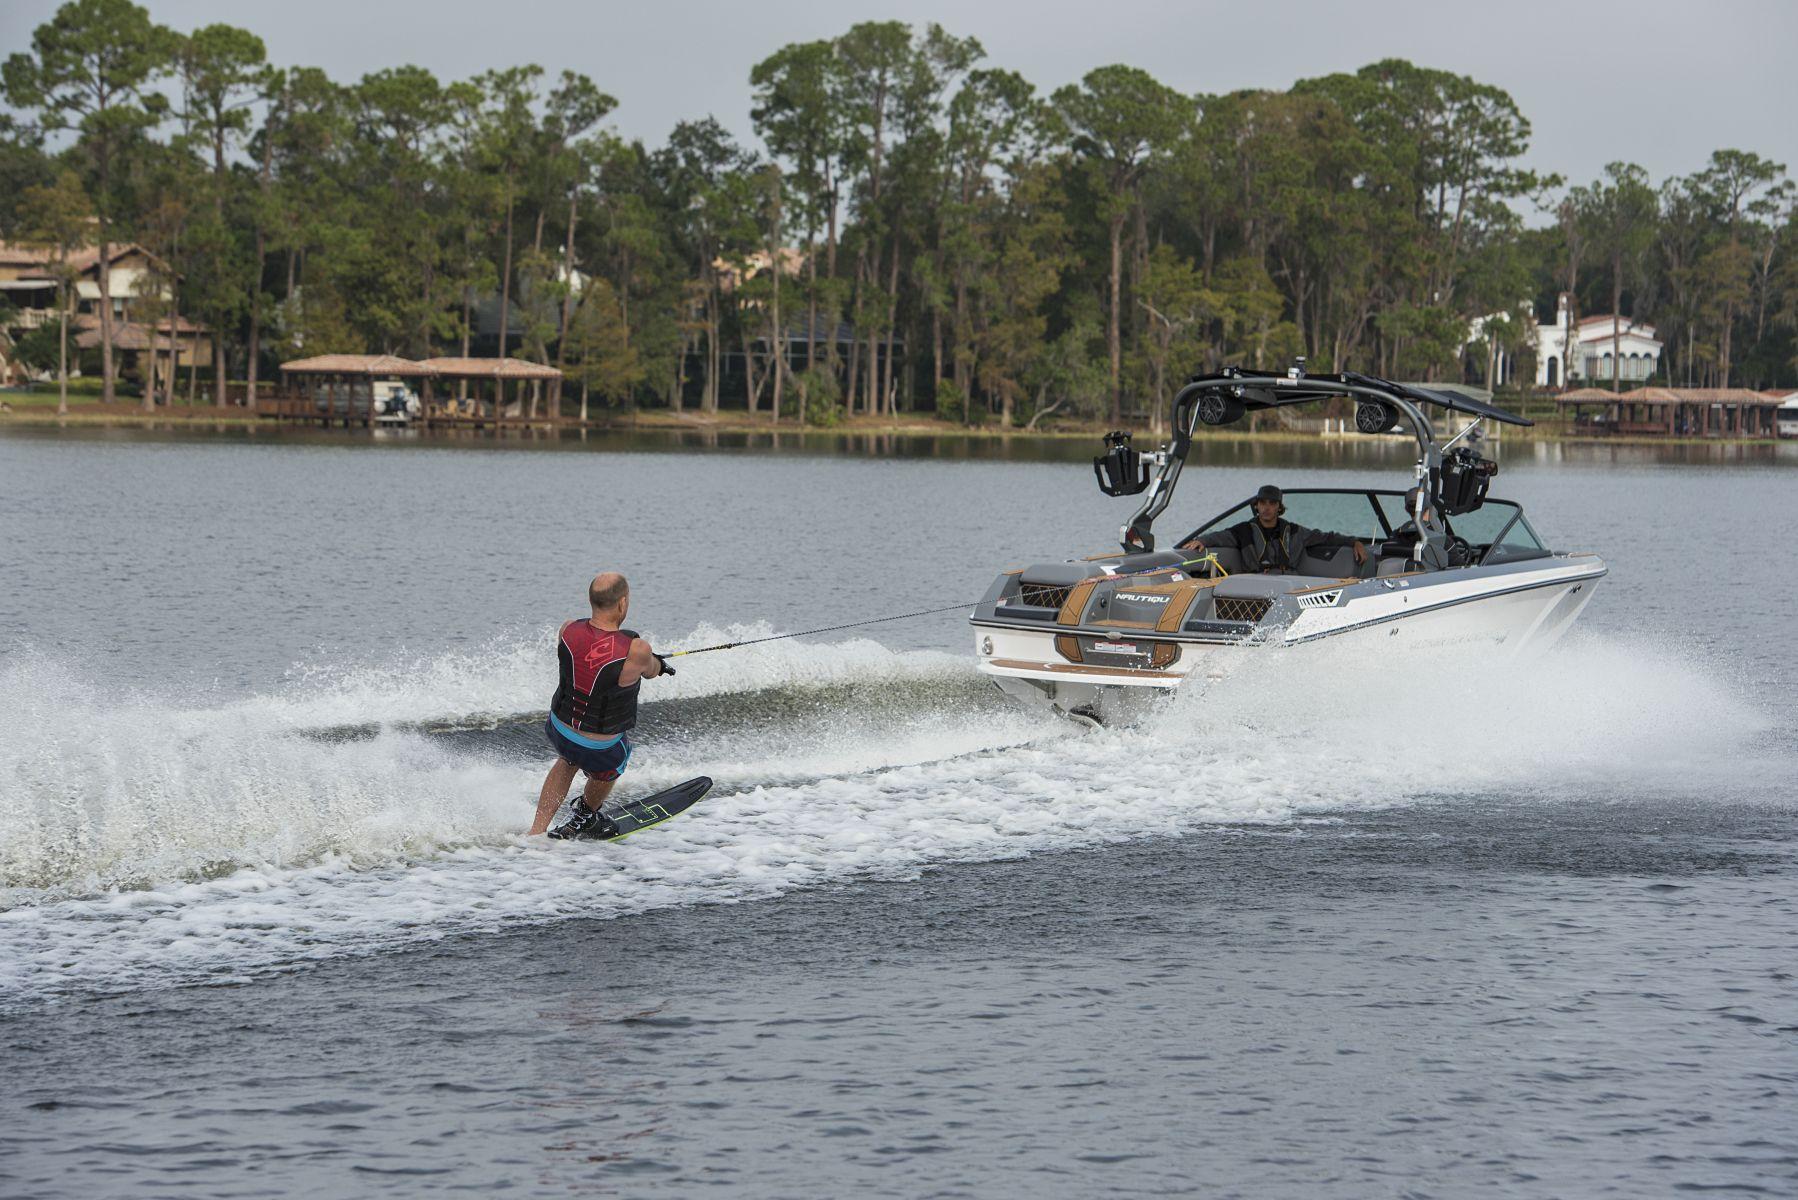 Water skiing behind a water ski boat on Lake Sheen in Orlando, Florida.